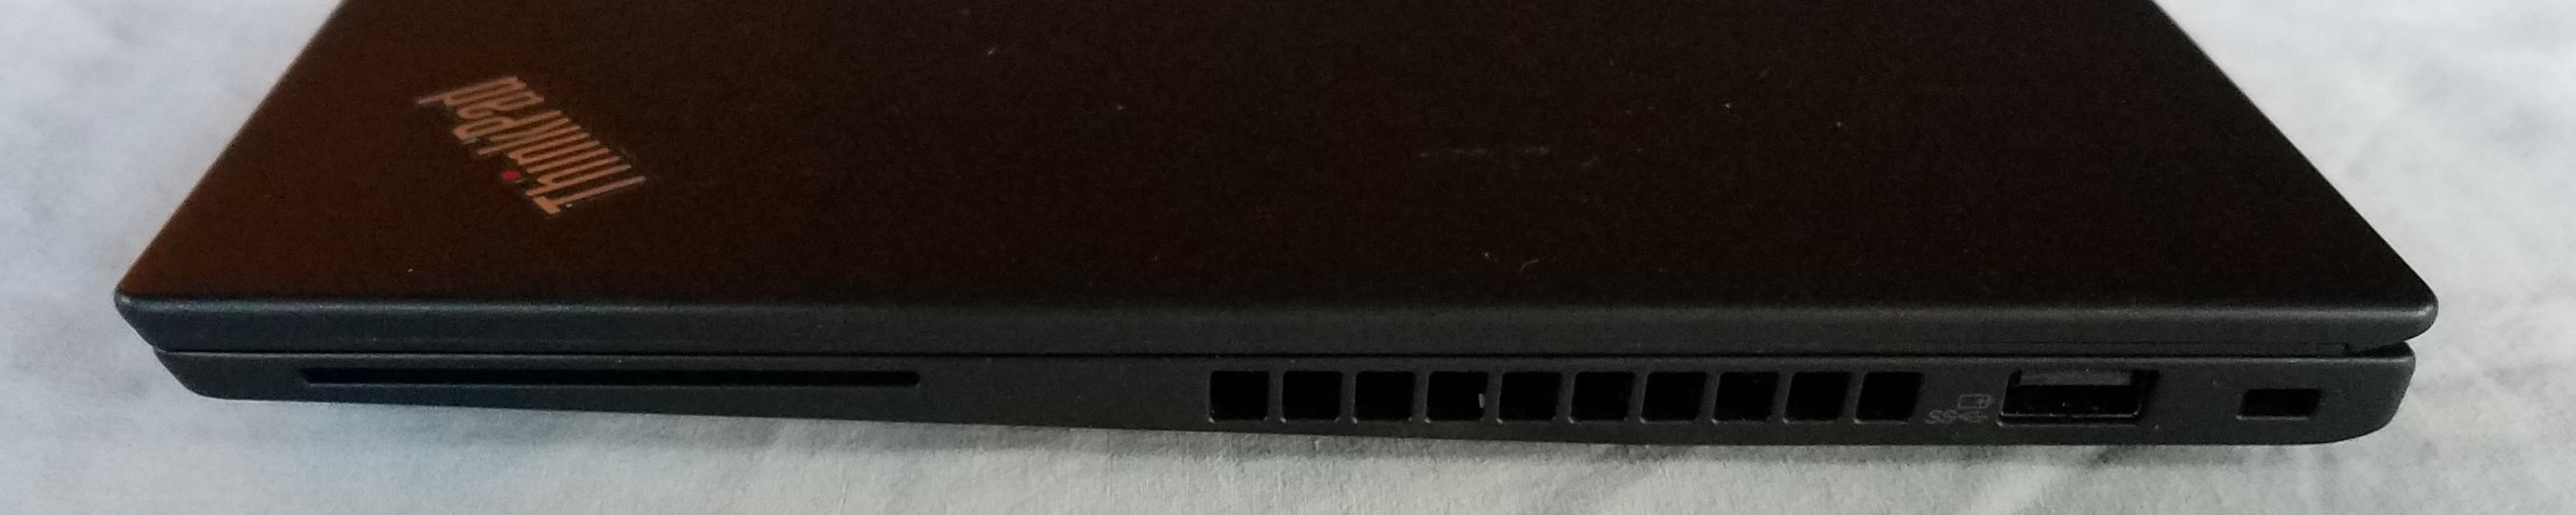 ThinkPad X280: First Look | GeezBlog